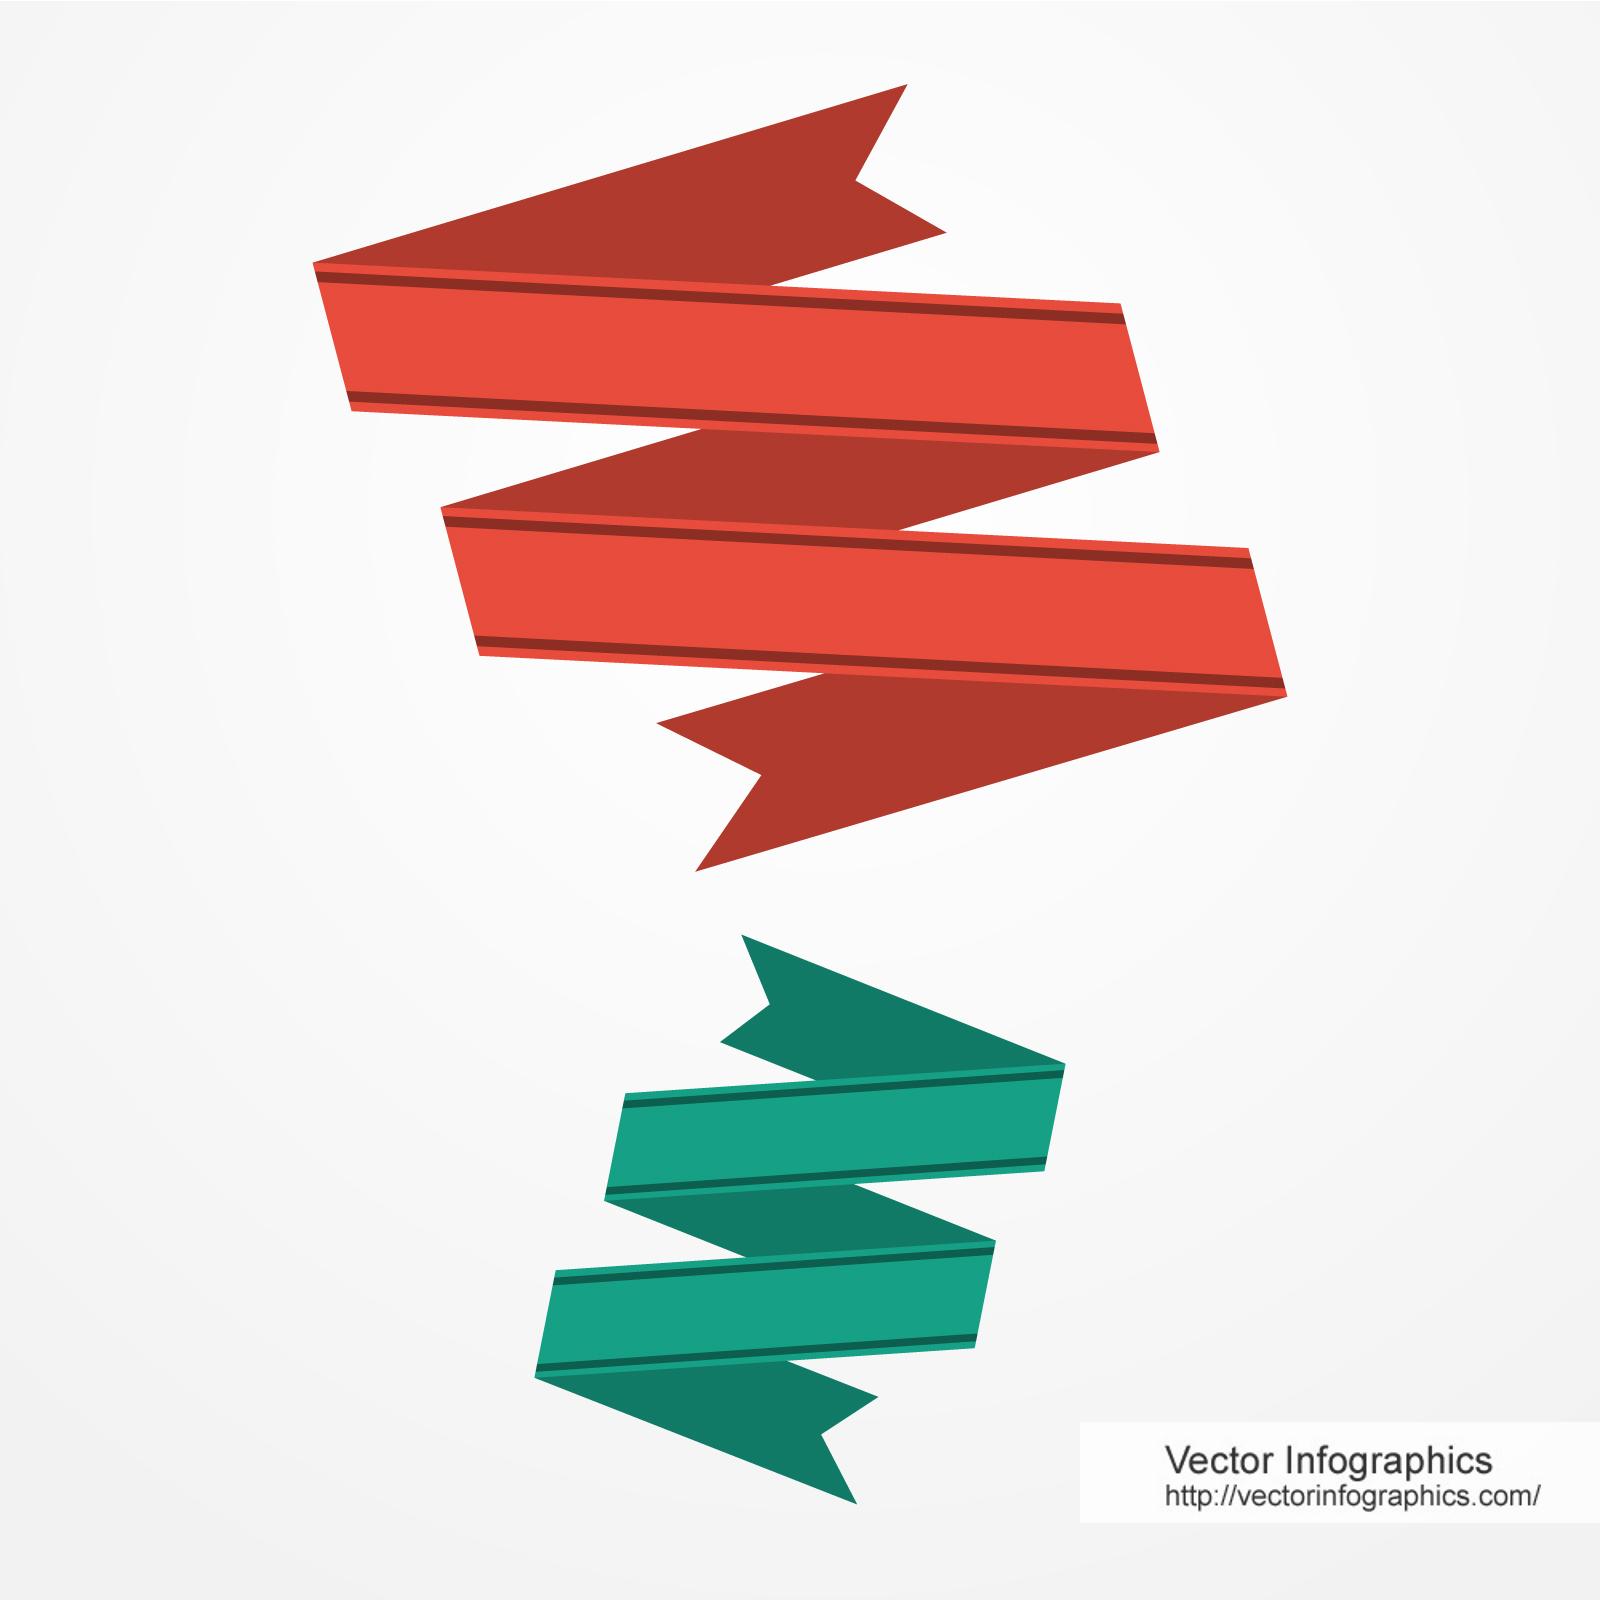 ZigZag shape flat ribbons Free Download Vector Image #76.